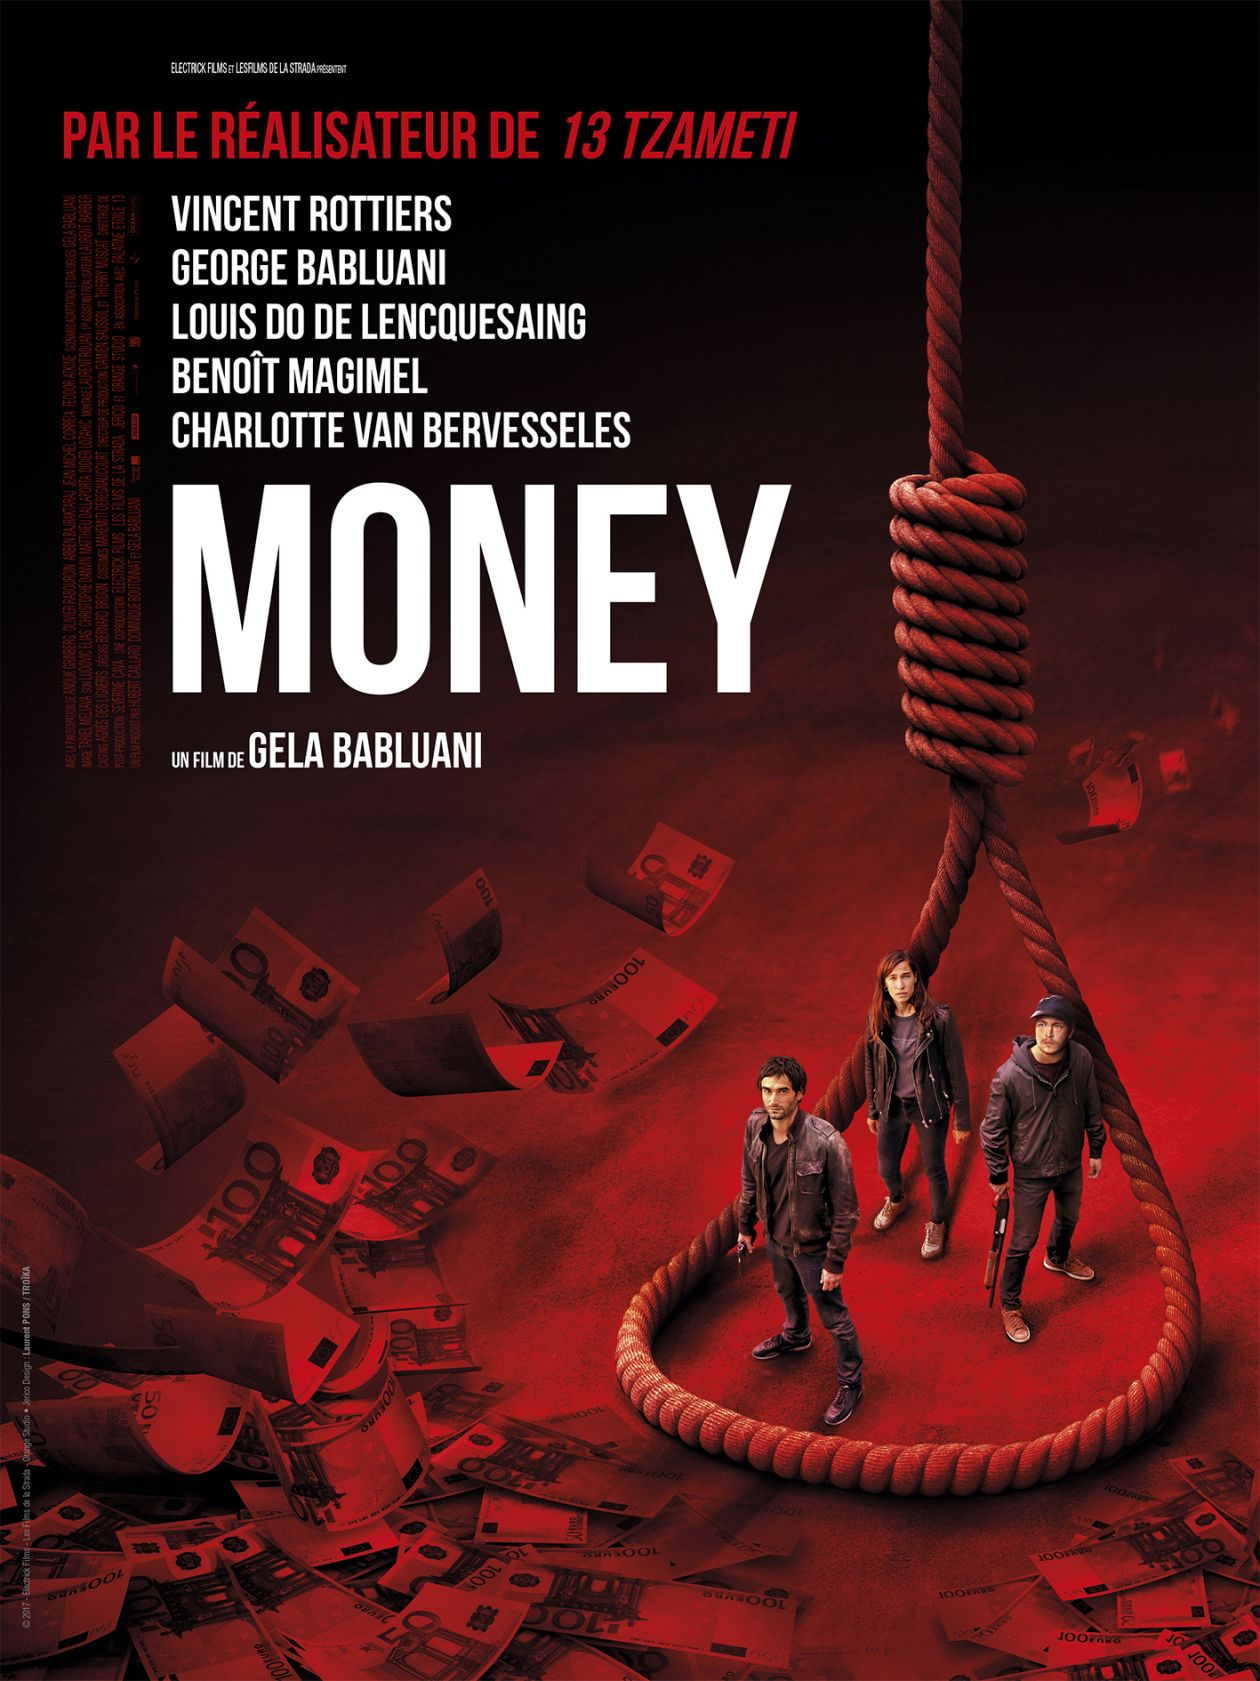 Charlotte Van Bervesseles French actress : Alexandra | Money | GELA BABLUANI | 27 SEPTEMBRE 2017 / Movie Poster / Affiche du film